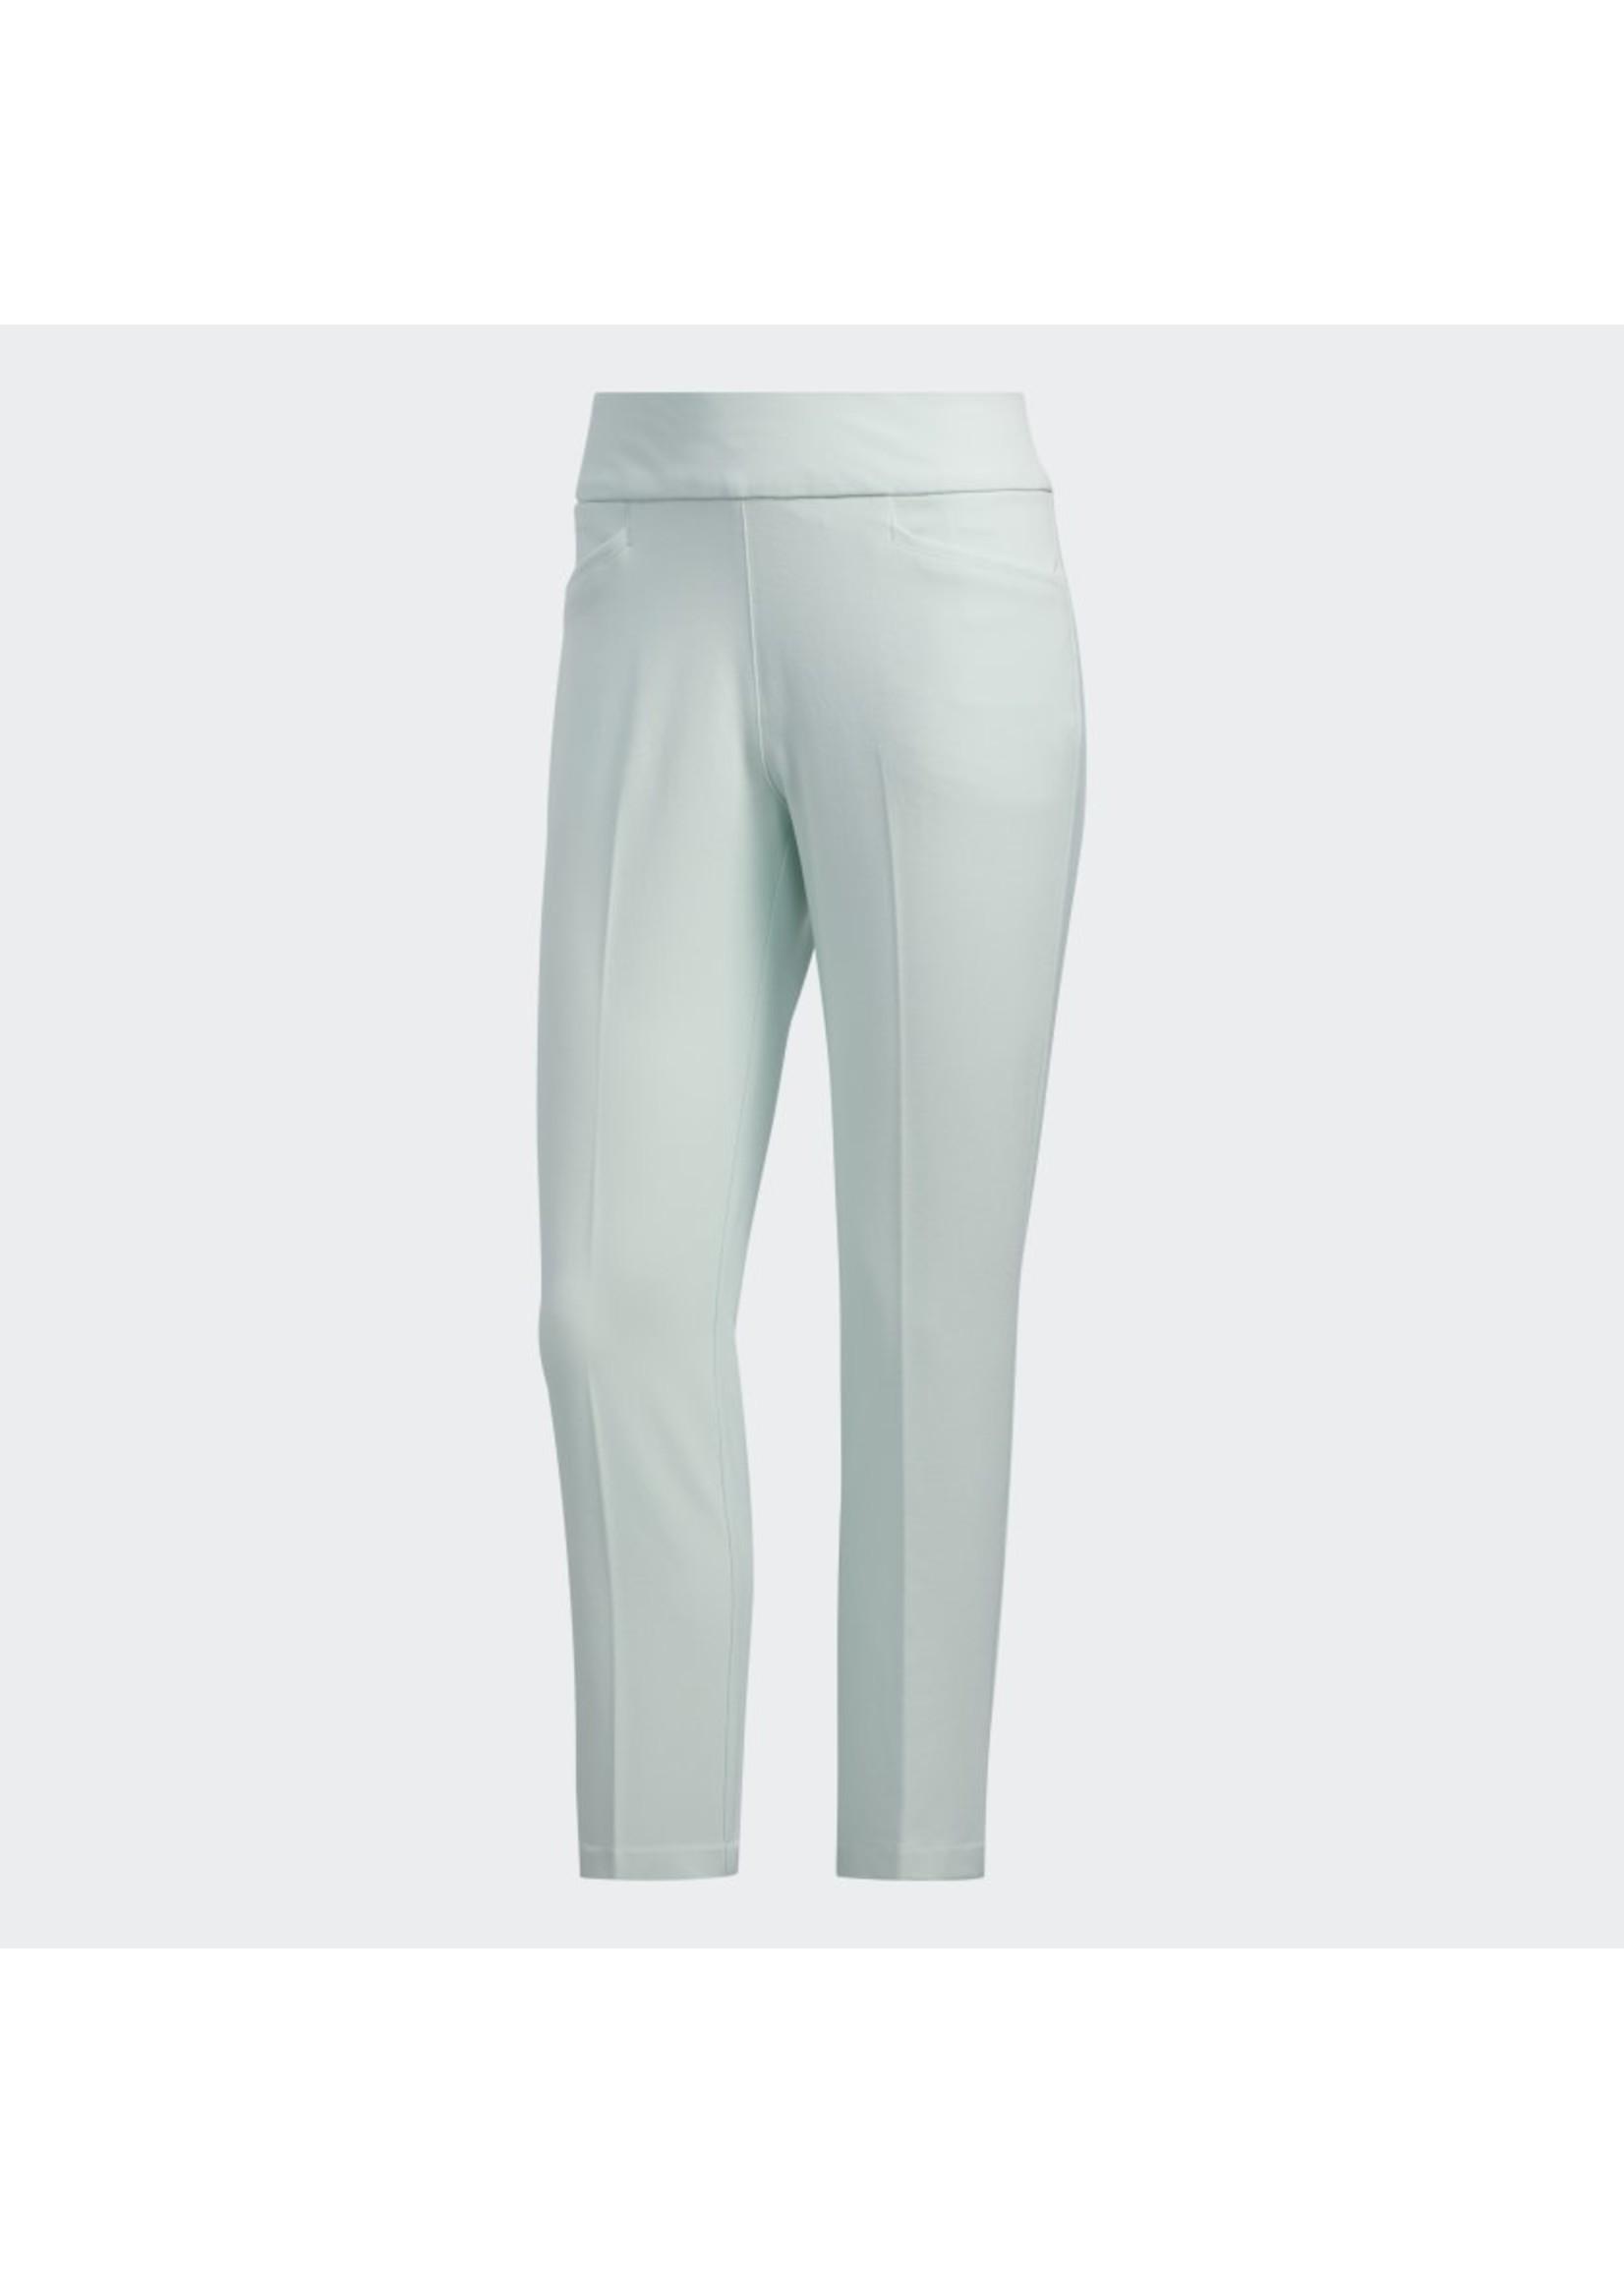 Adidas Adidas F19536 Ladies Pull On Ankle Pant (2020) Dash Green